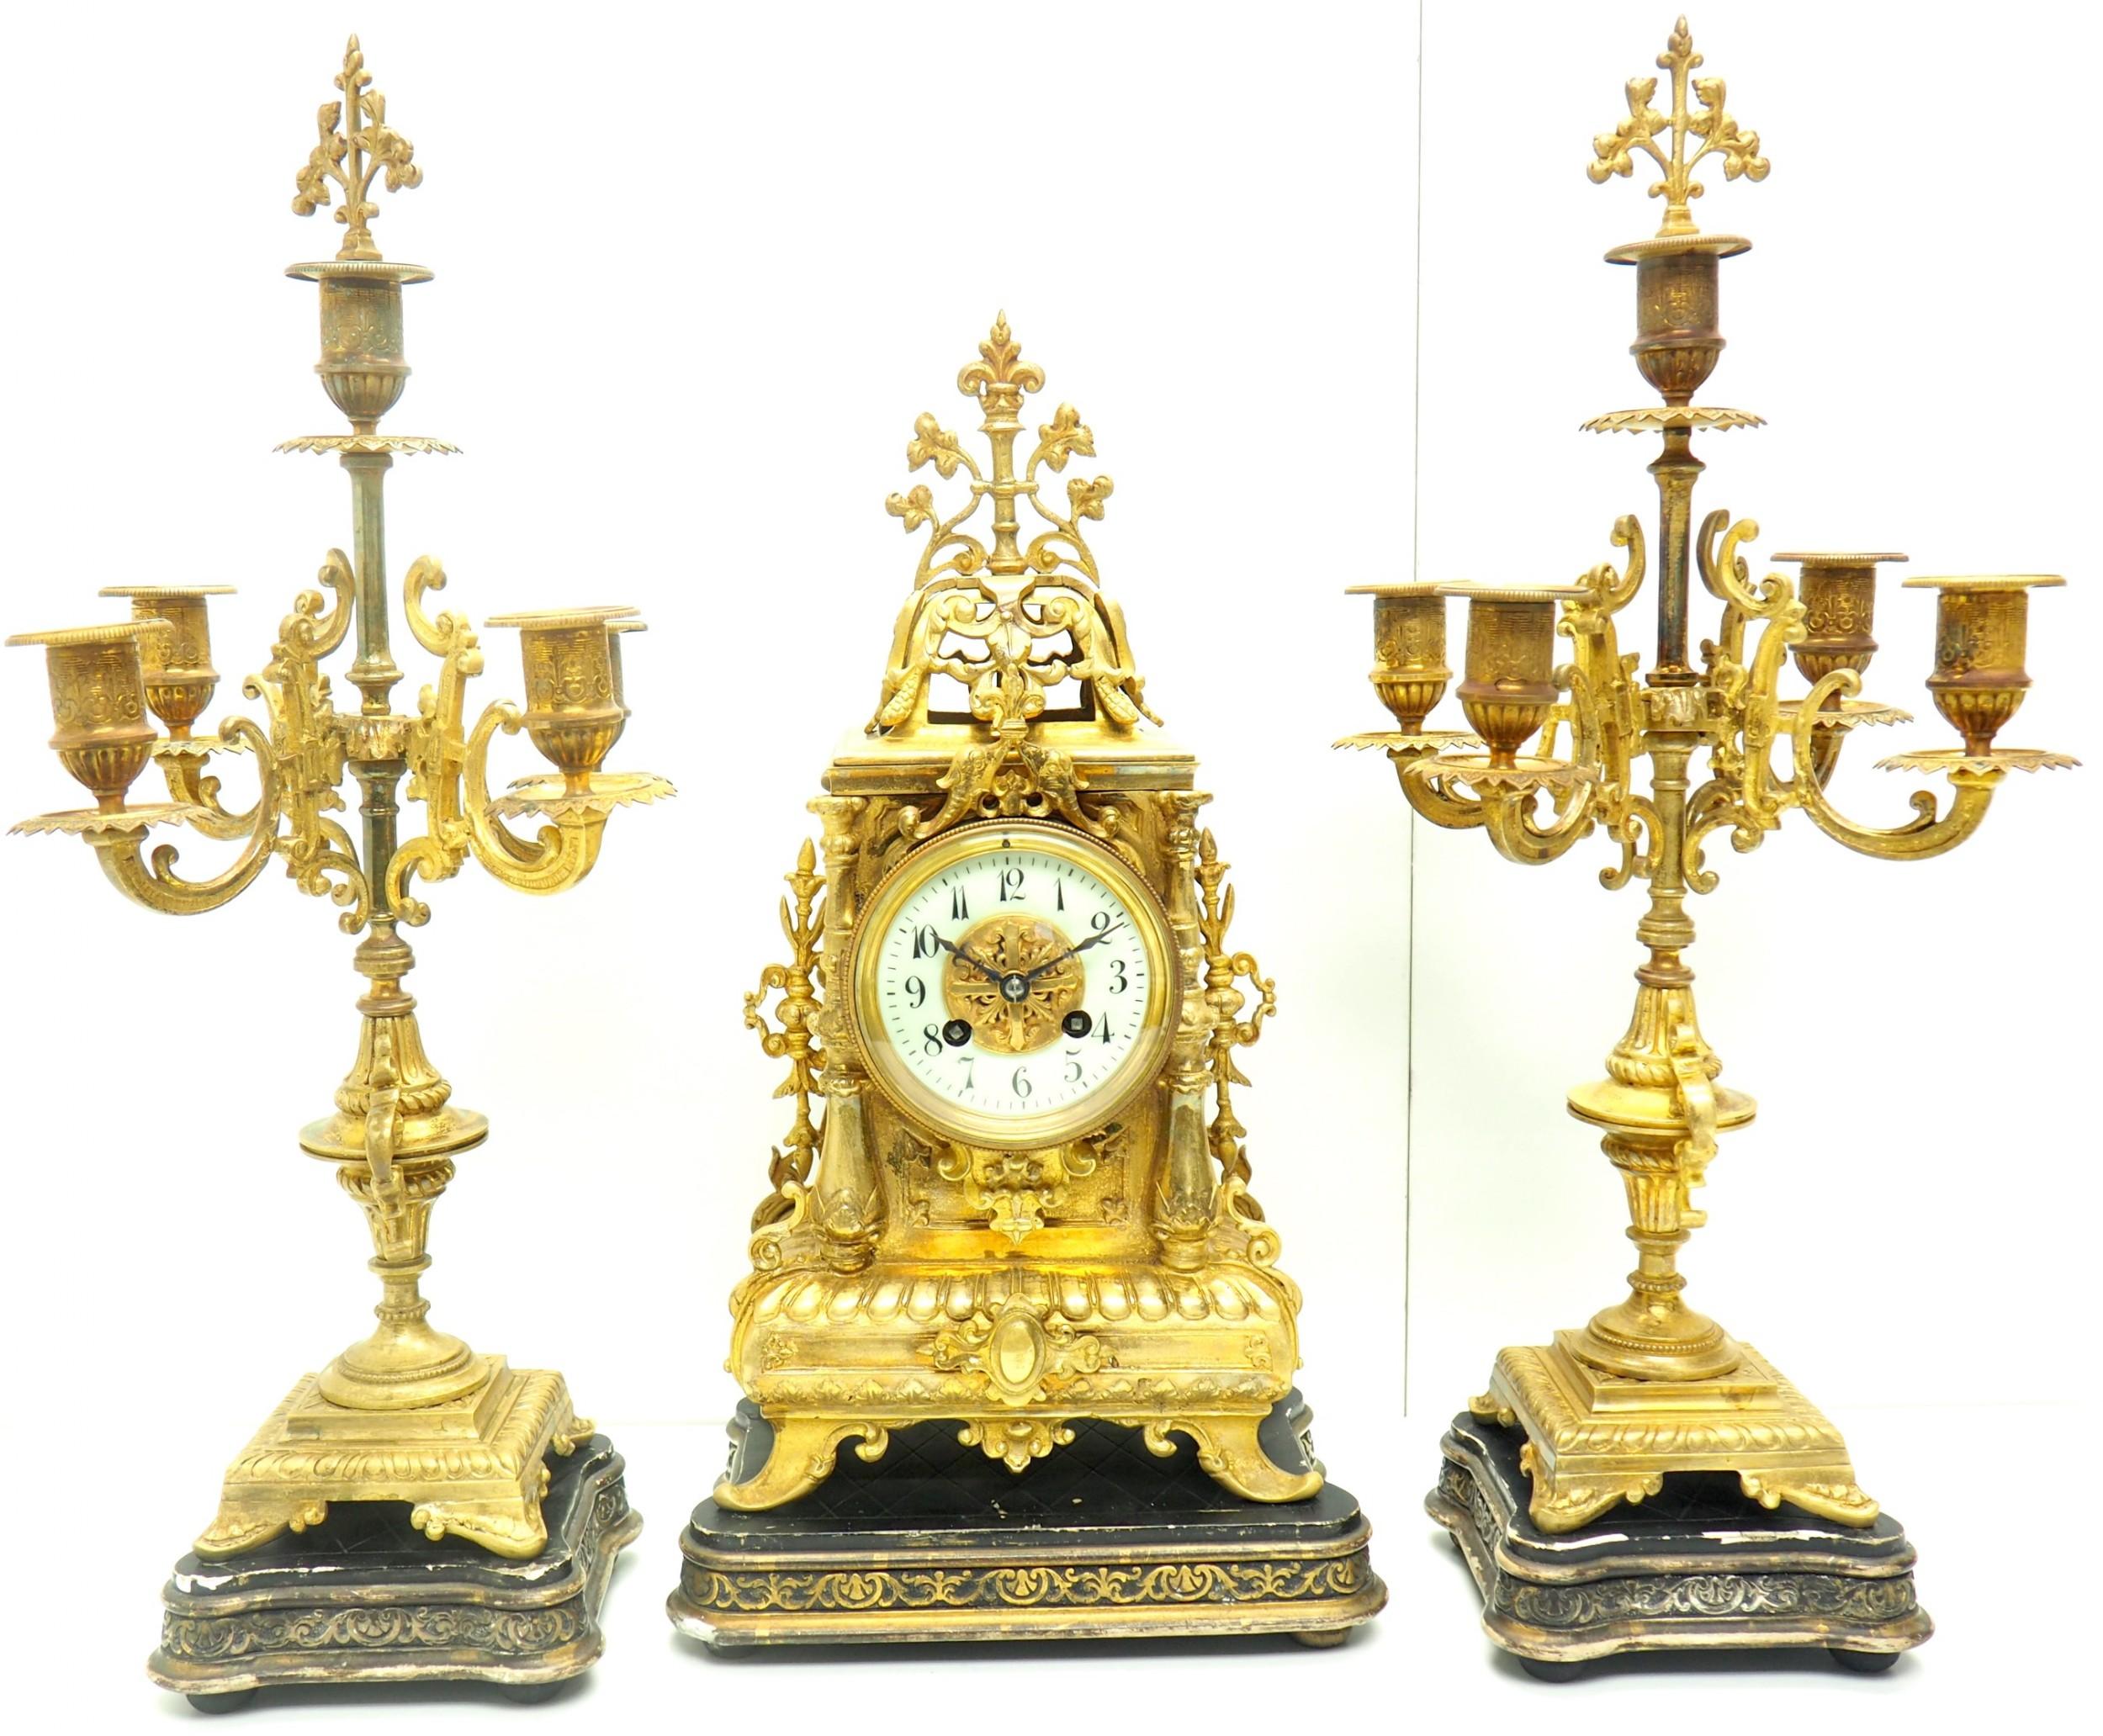 superb antique french ormolu mantel candelabra clock set embossed decoration finial 8 day striking